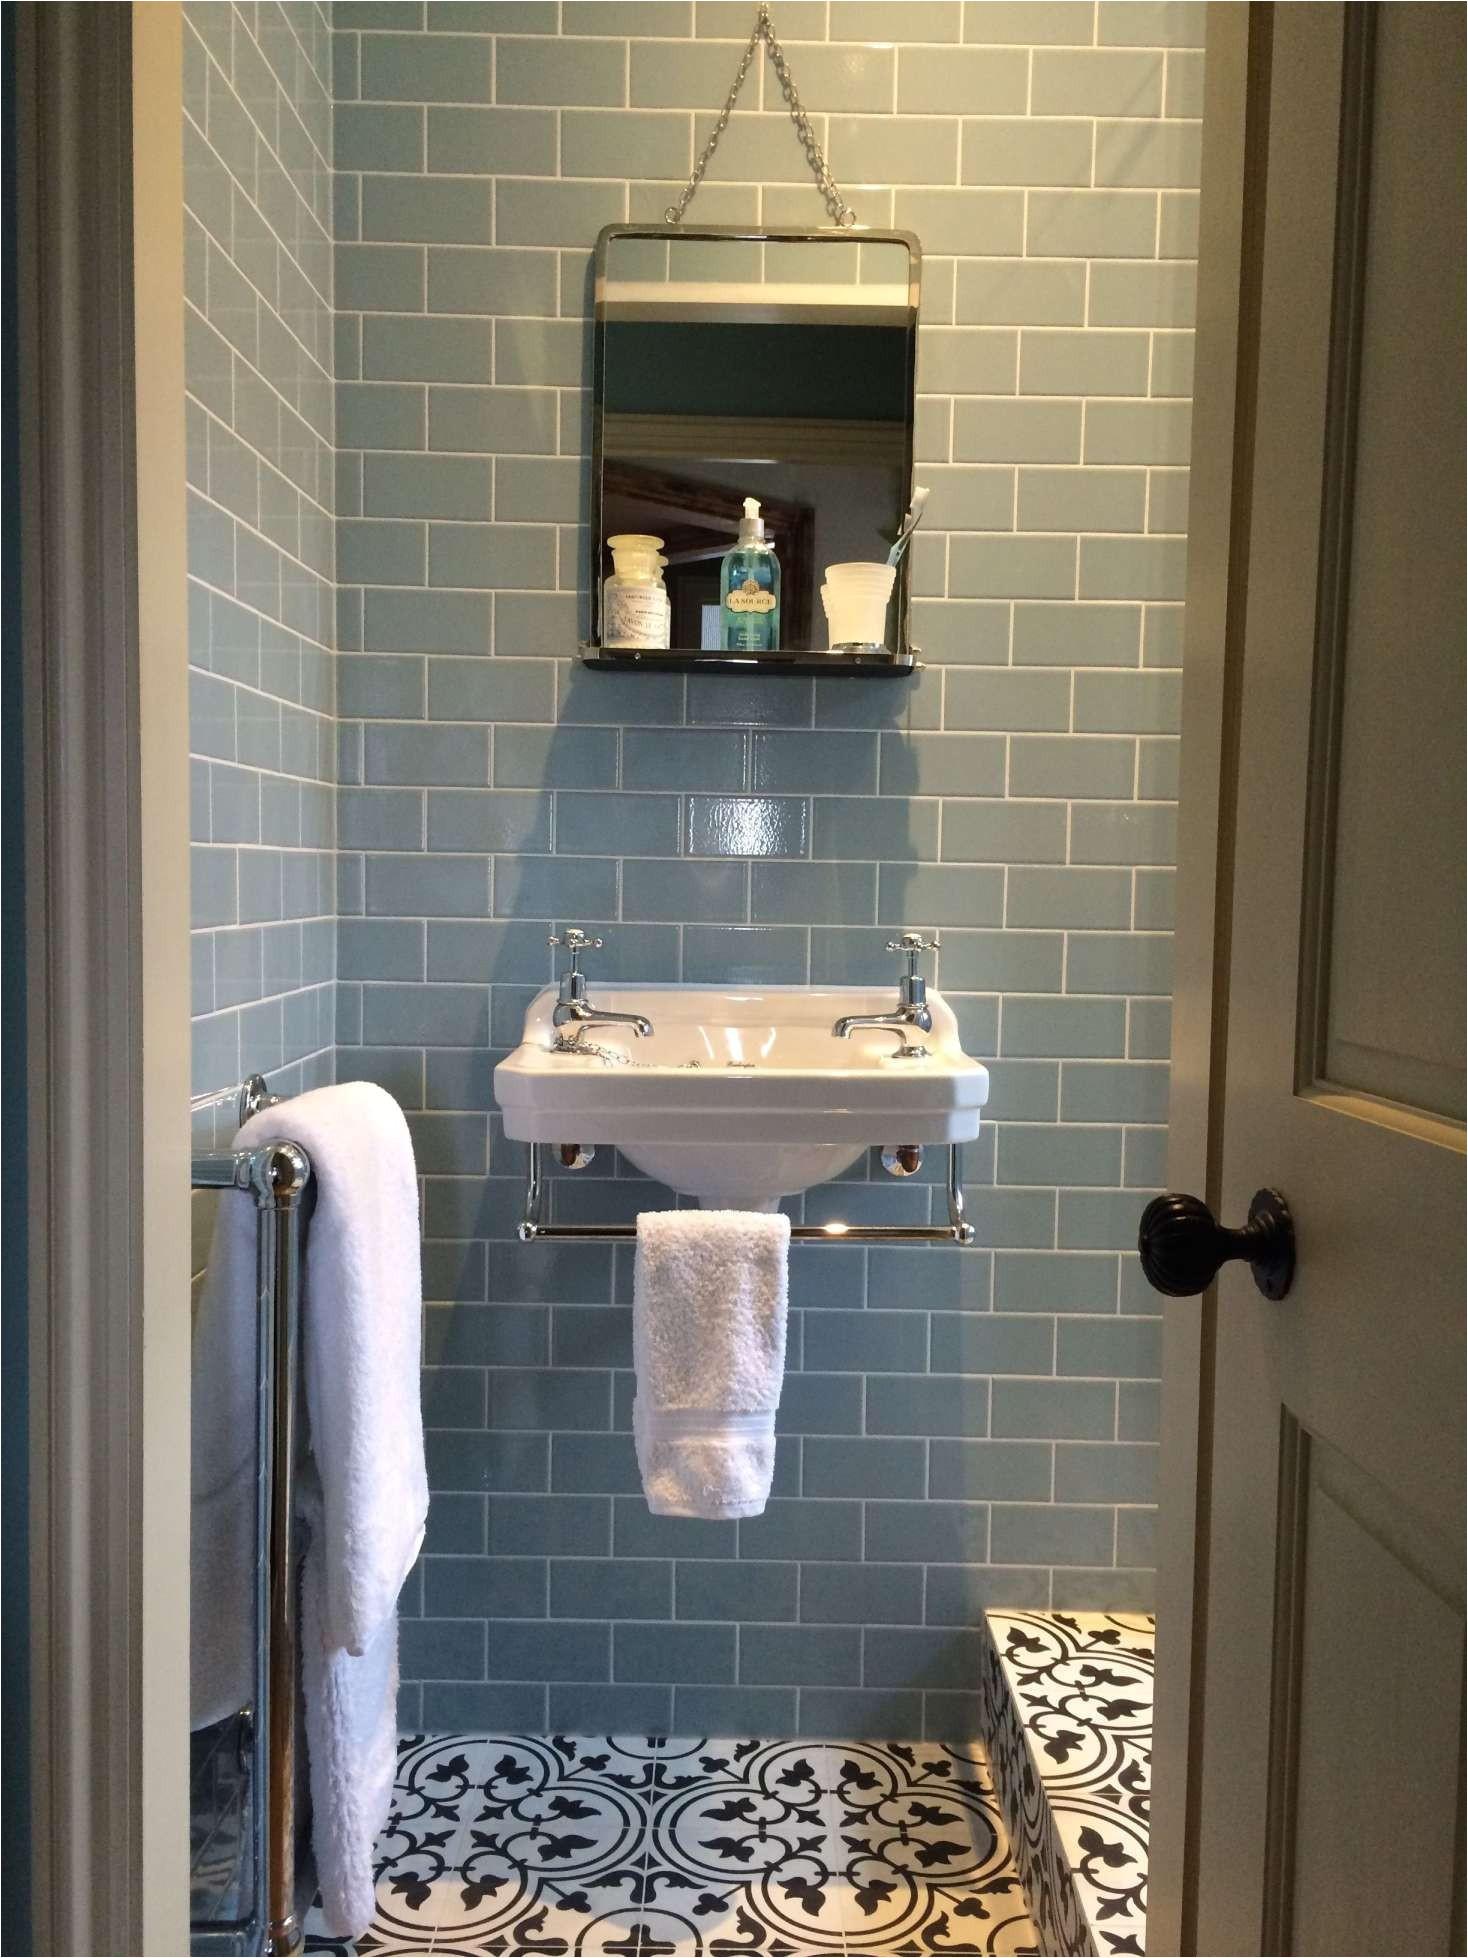 Bathroom Floor Tiles Design Ideas For Small Bathrooms Delightful